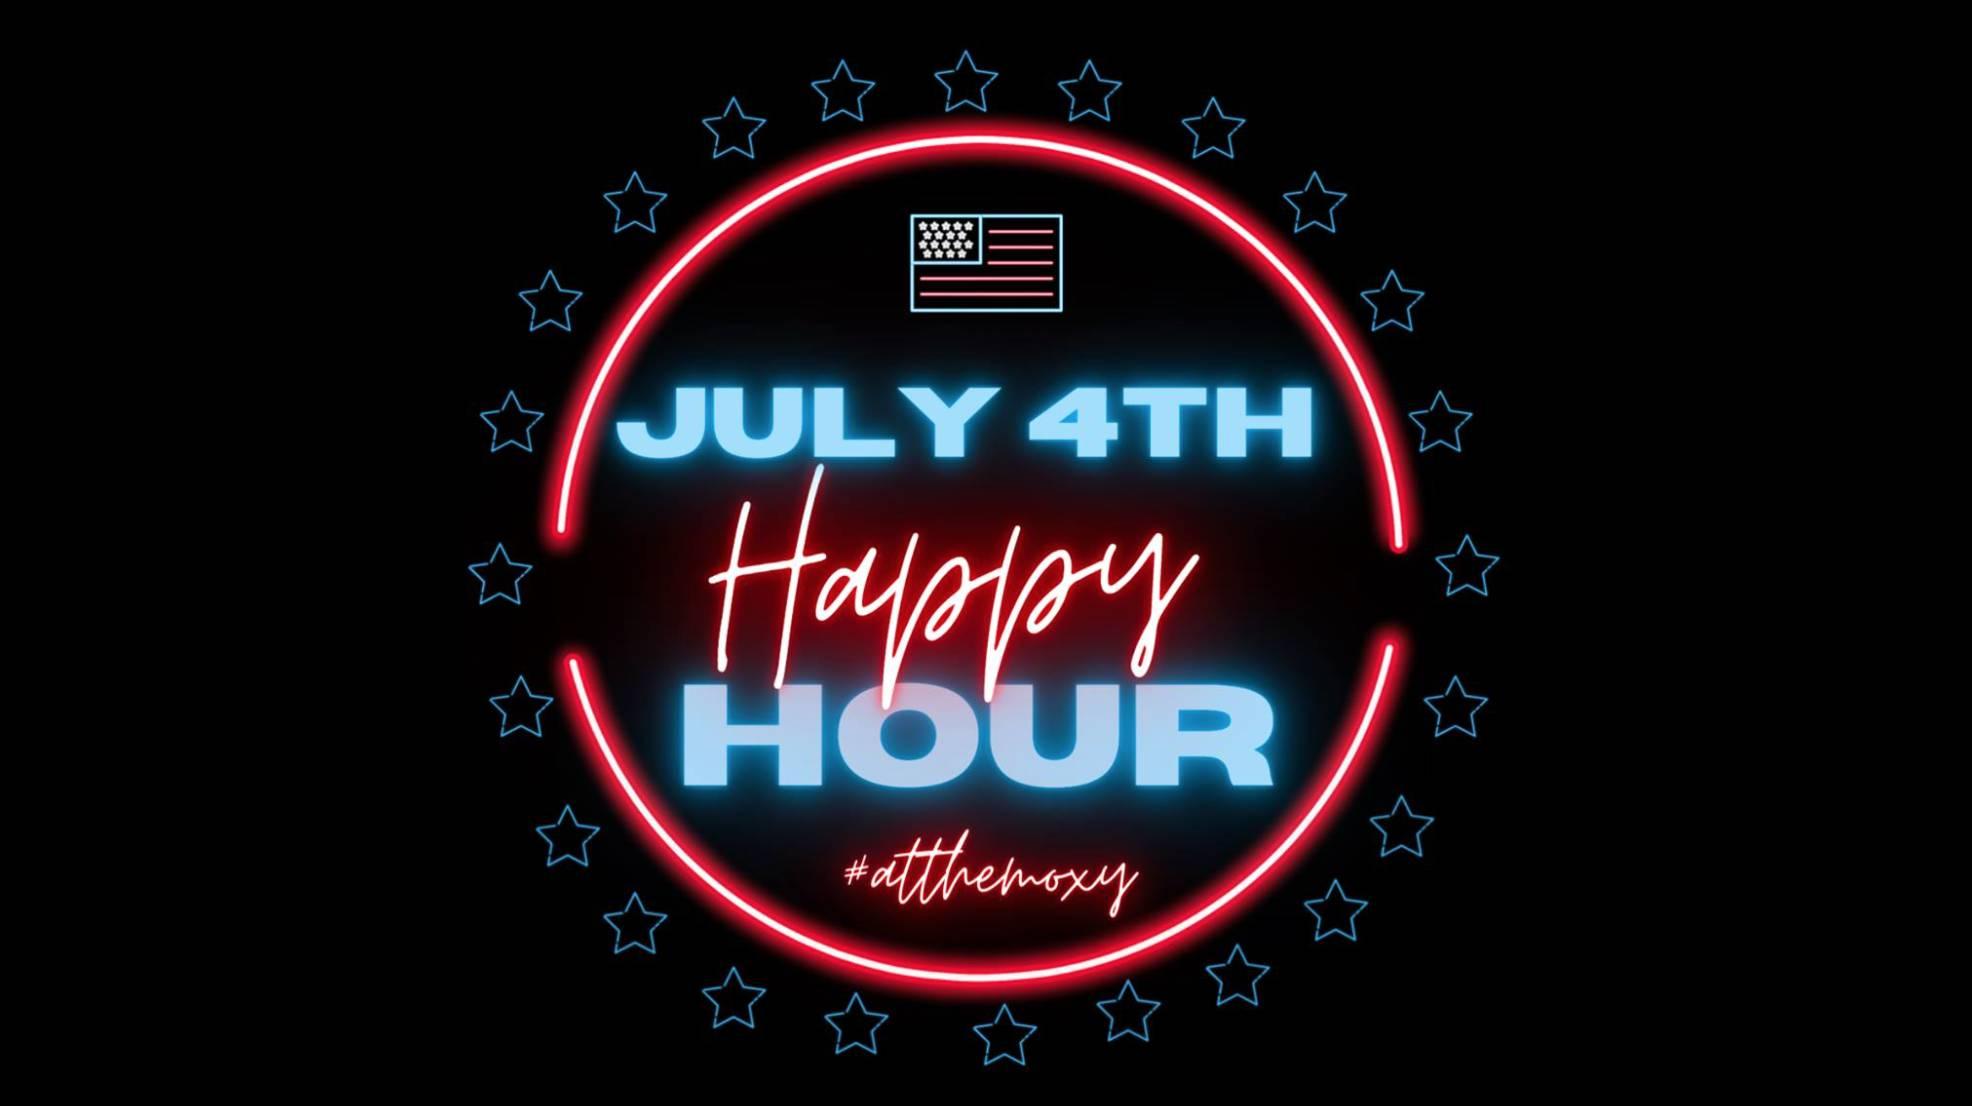 July 4th Happy Hour #atthemoxy